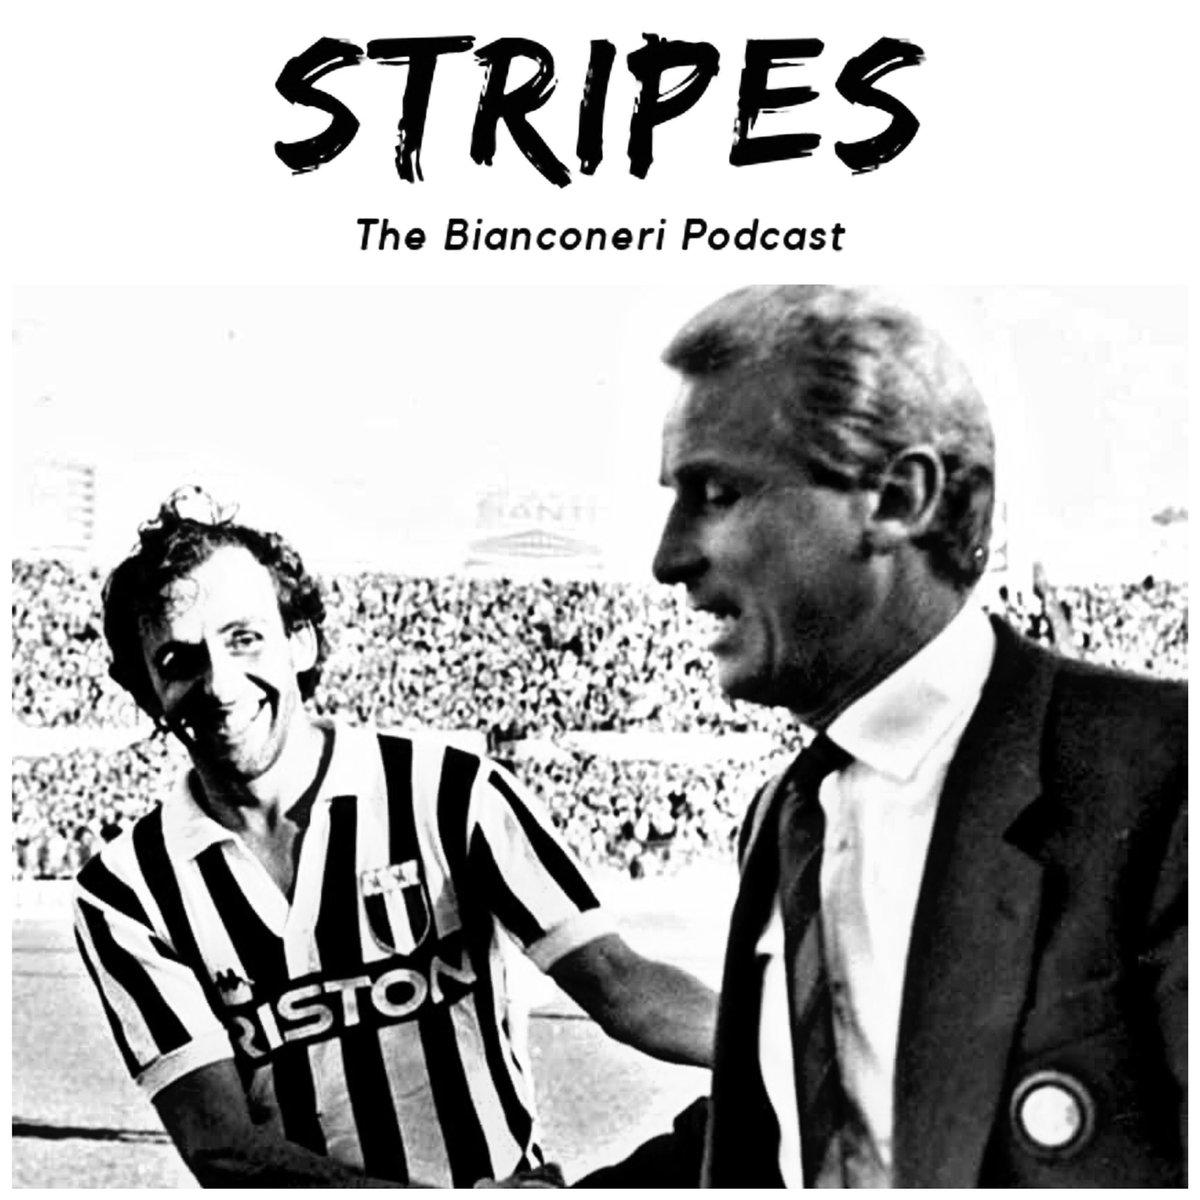 Yes Michel...Stripes will be back tomorrow!!! If u love Juventus u need to follow @thestripespodcast   #juve #juventus #finoallafine #finoallafineforzajuventus #forzajuve #forzajuventus #seriea #soccer #calcio #adp10 #CR7 #pirlo #jbworld #radiobianconera https://t.co/Py7LiiCHp1